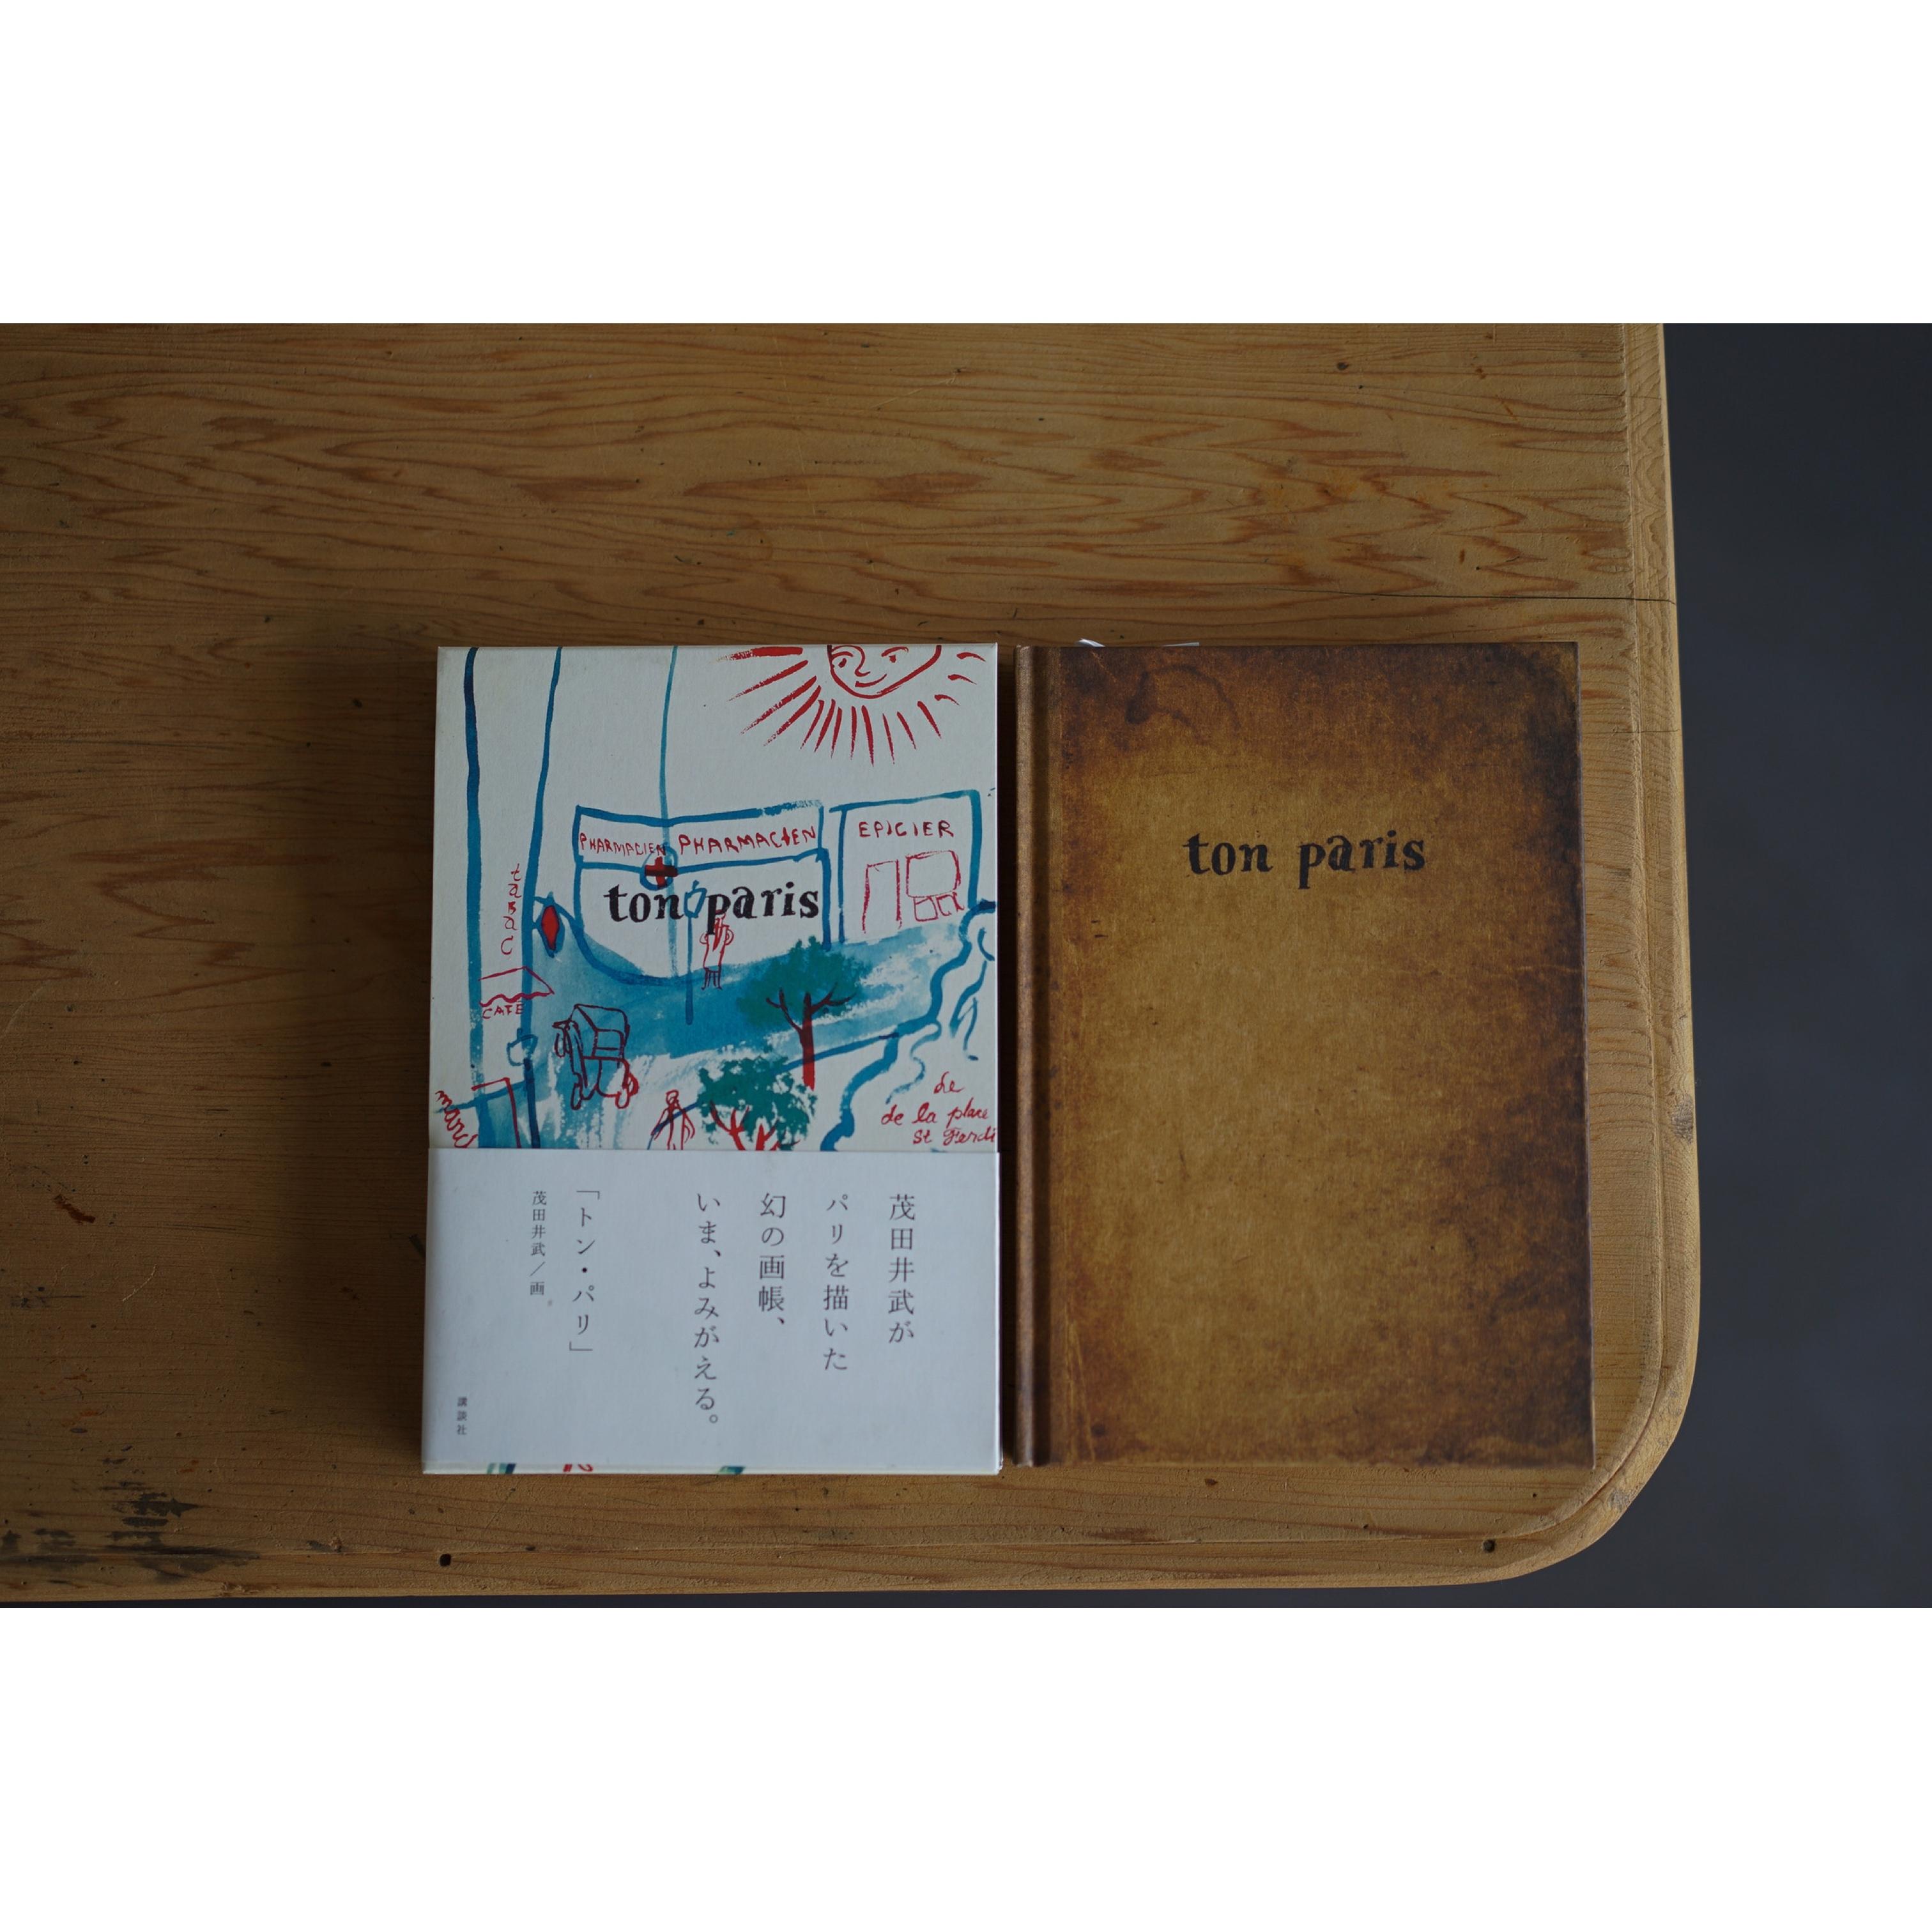 『ton paris』 茂田井 武/絵 広松 由希/解説(トレヴィル 1994)